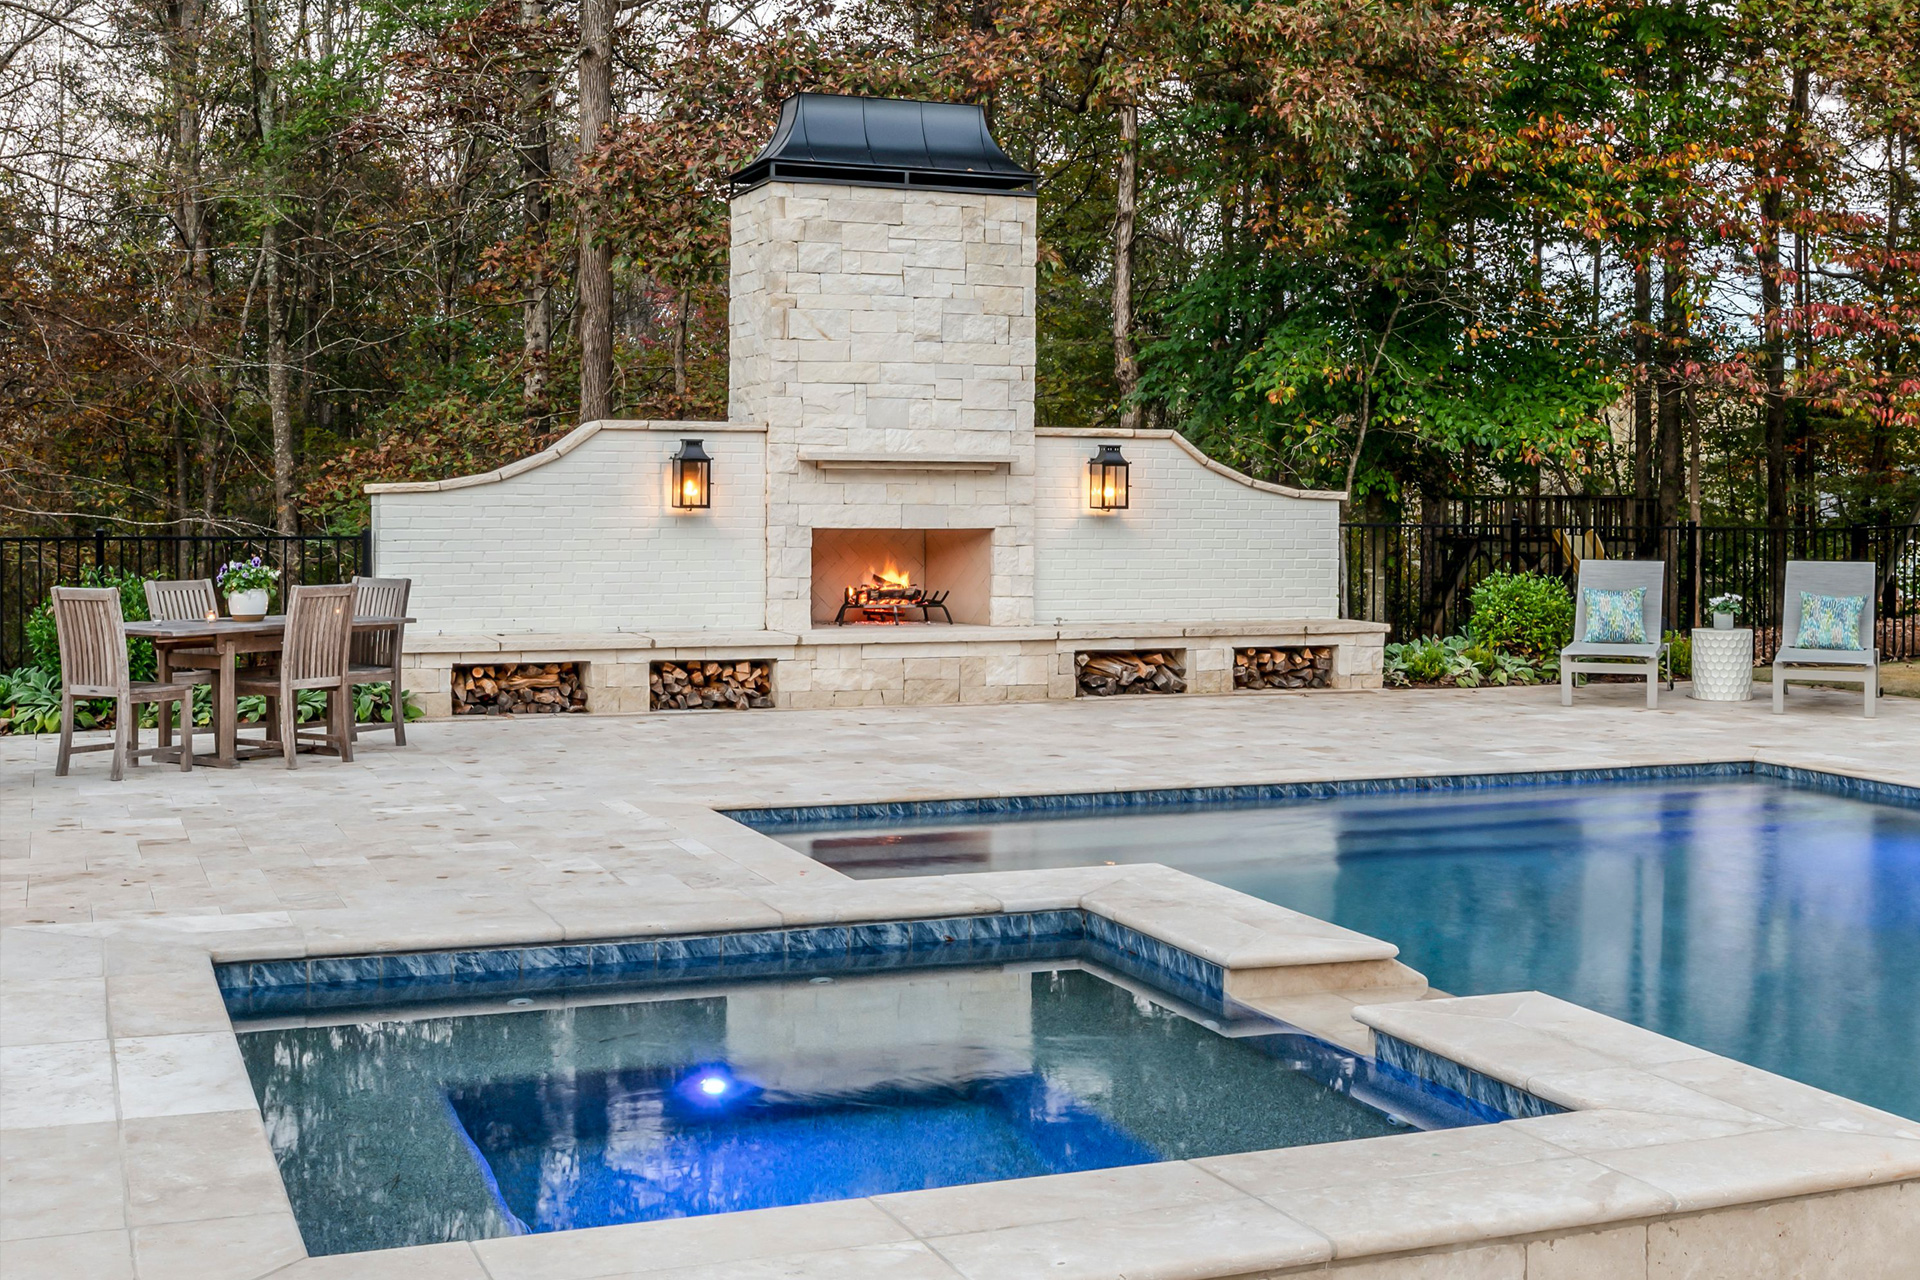 Pool Design Custom Limestone Fireplace with Travertine Pool Deck